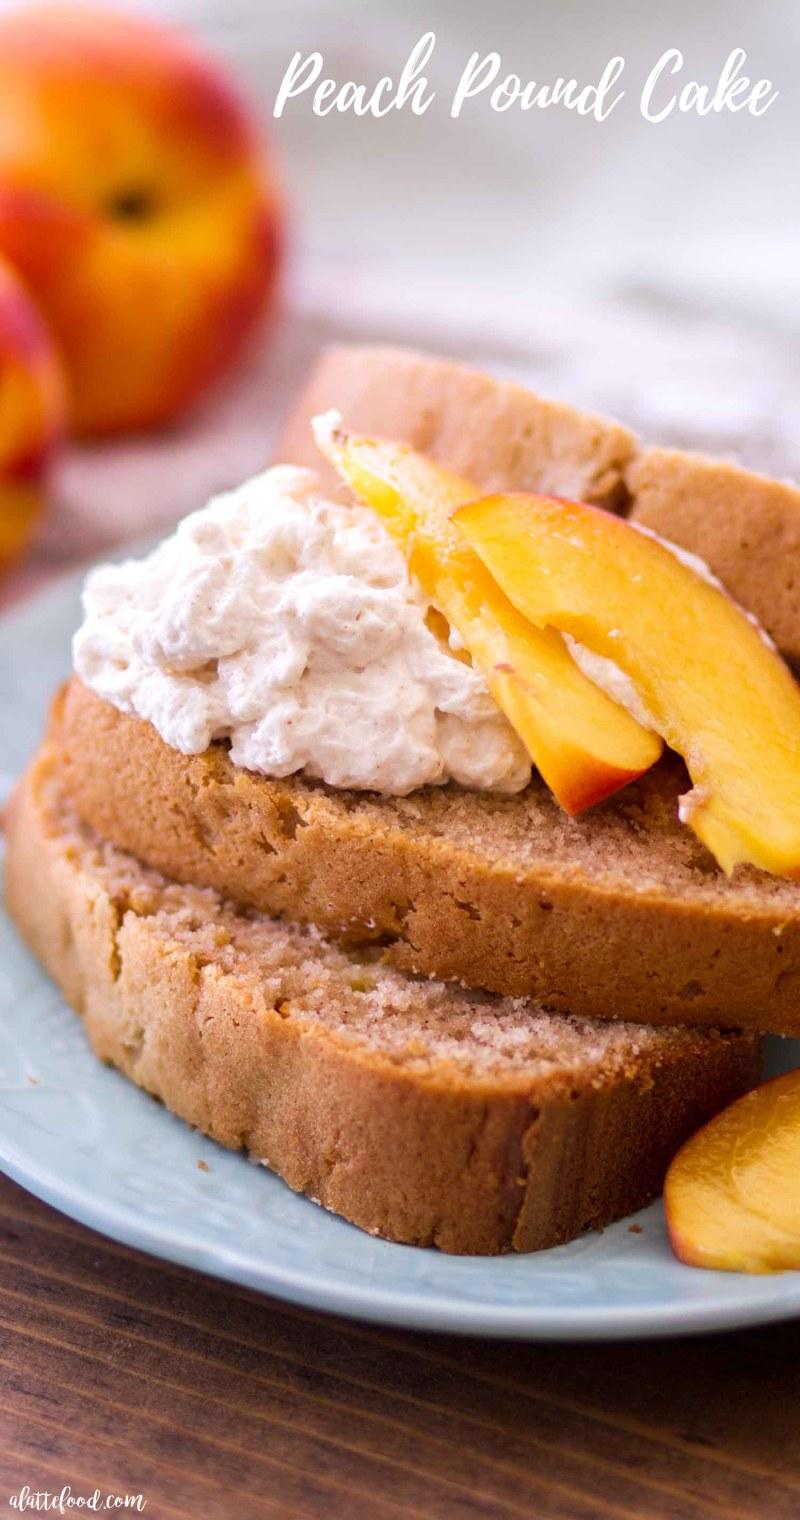 homemade peach pound cake with fresh peaches and whipped cream